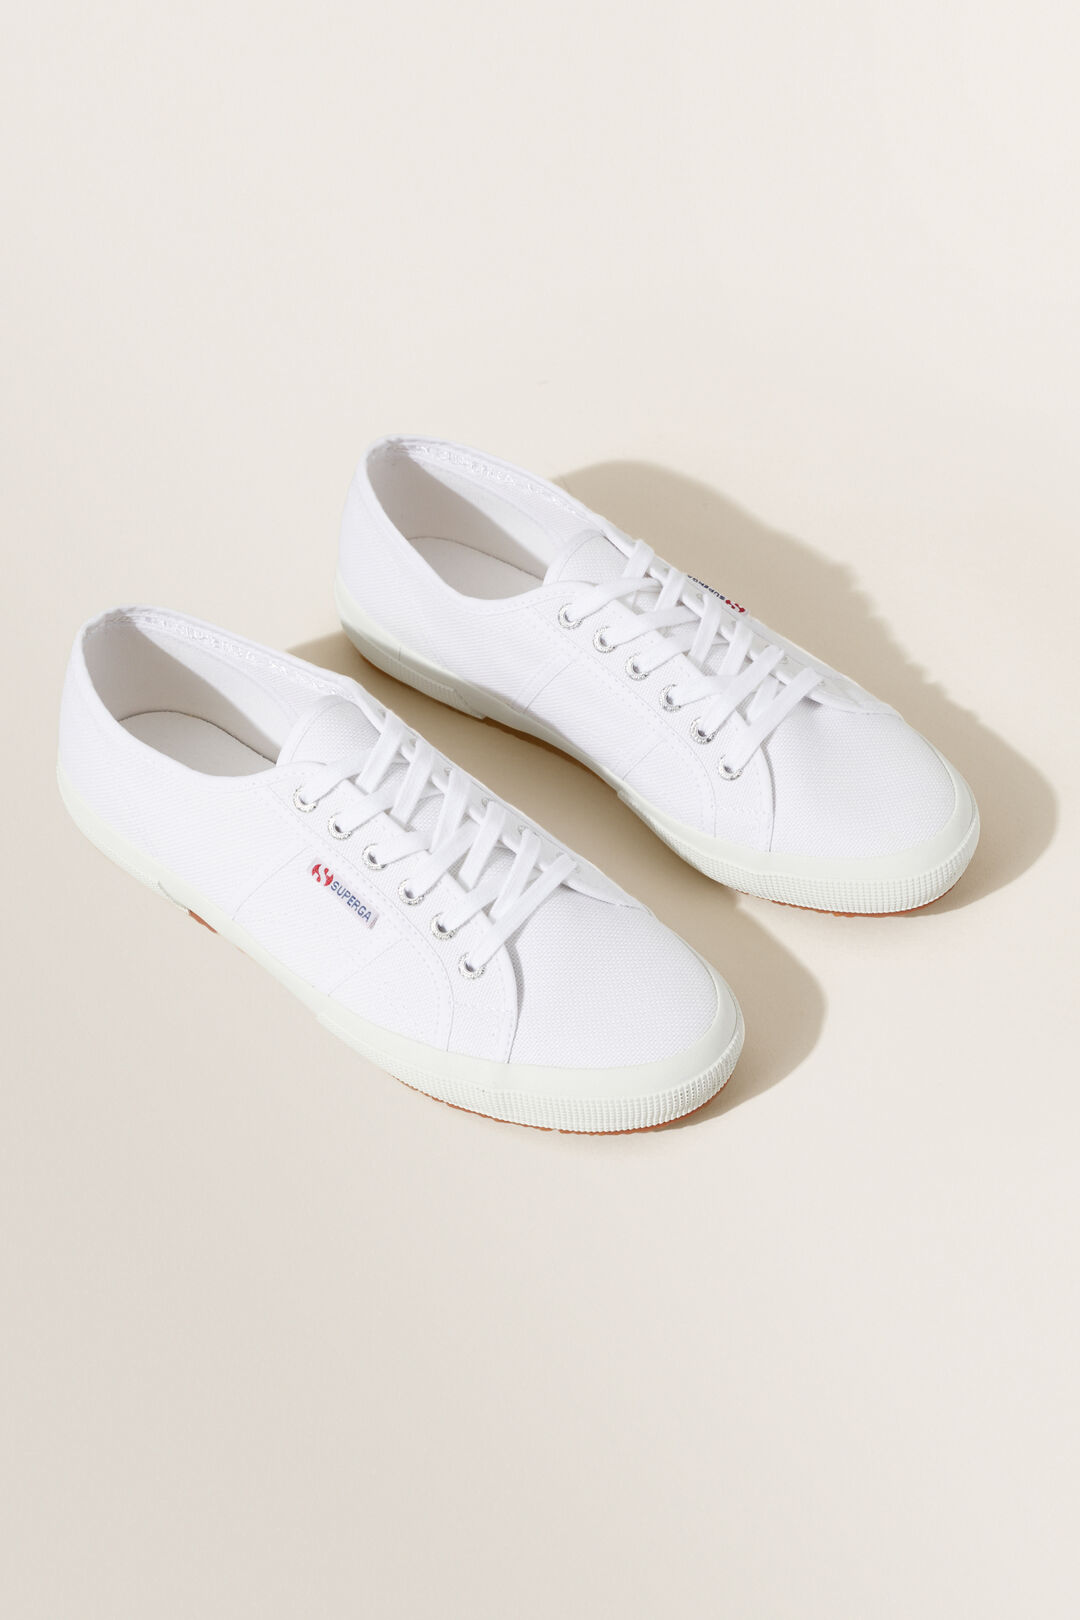 Mens Superga Classic Sneaker  WHITE  hi-res